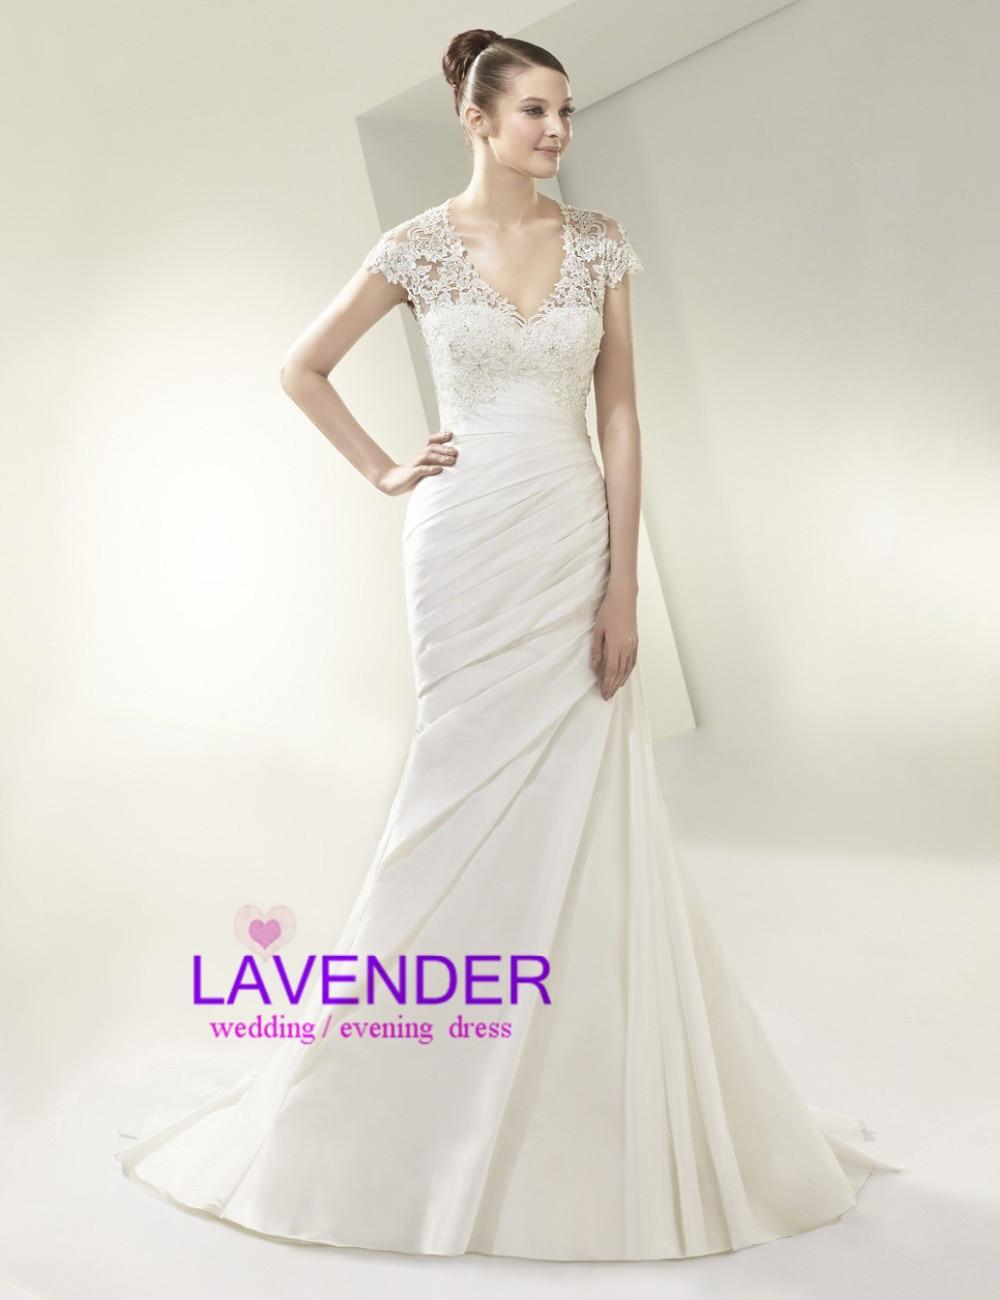 wedding dresses houston tx wedding dress sale online Wedding Gowns Dress in Houston Texas